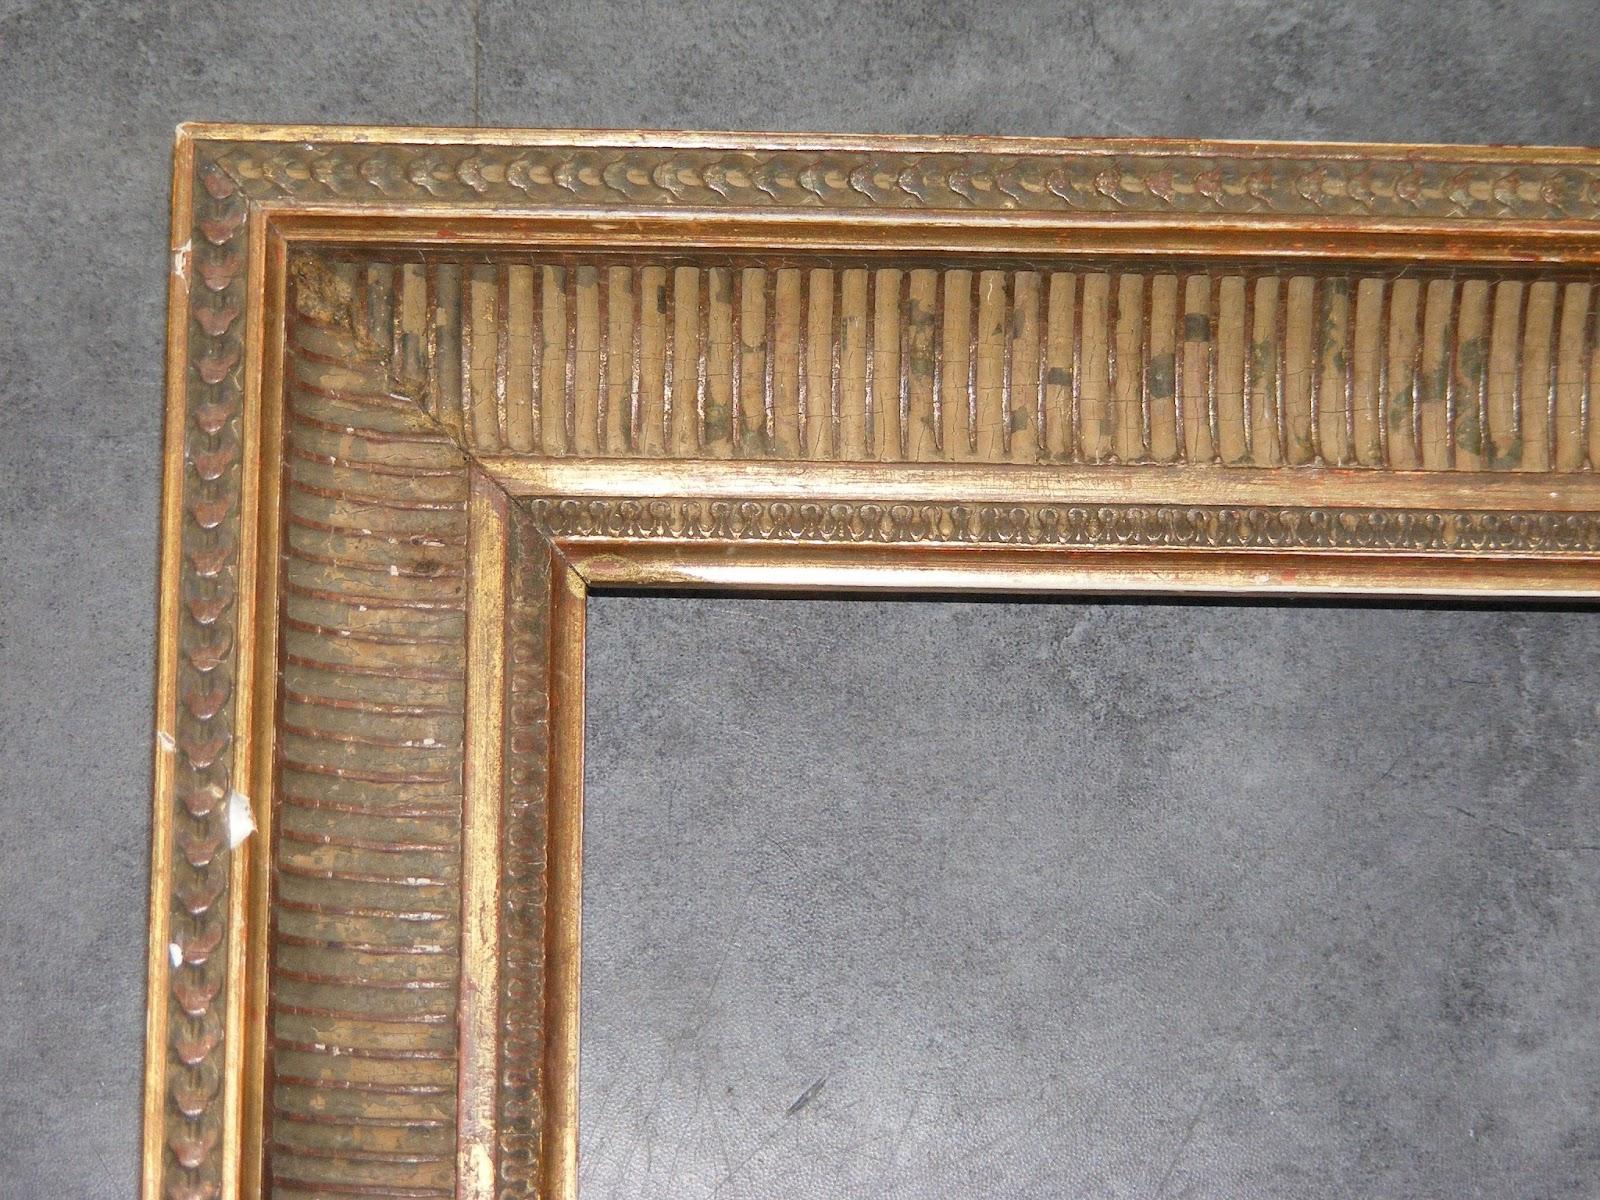 grand cadre ancien en bois rainure a restaurer 41 5cmx56cm cadr298 ebay. Black Bedroom Furniture Sets. Home Design Ideas